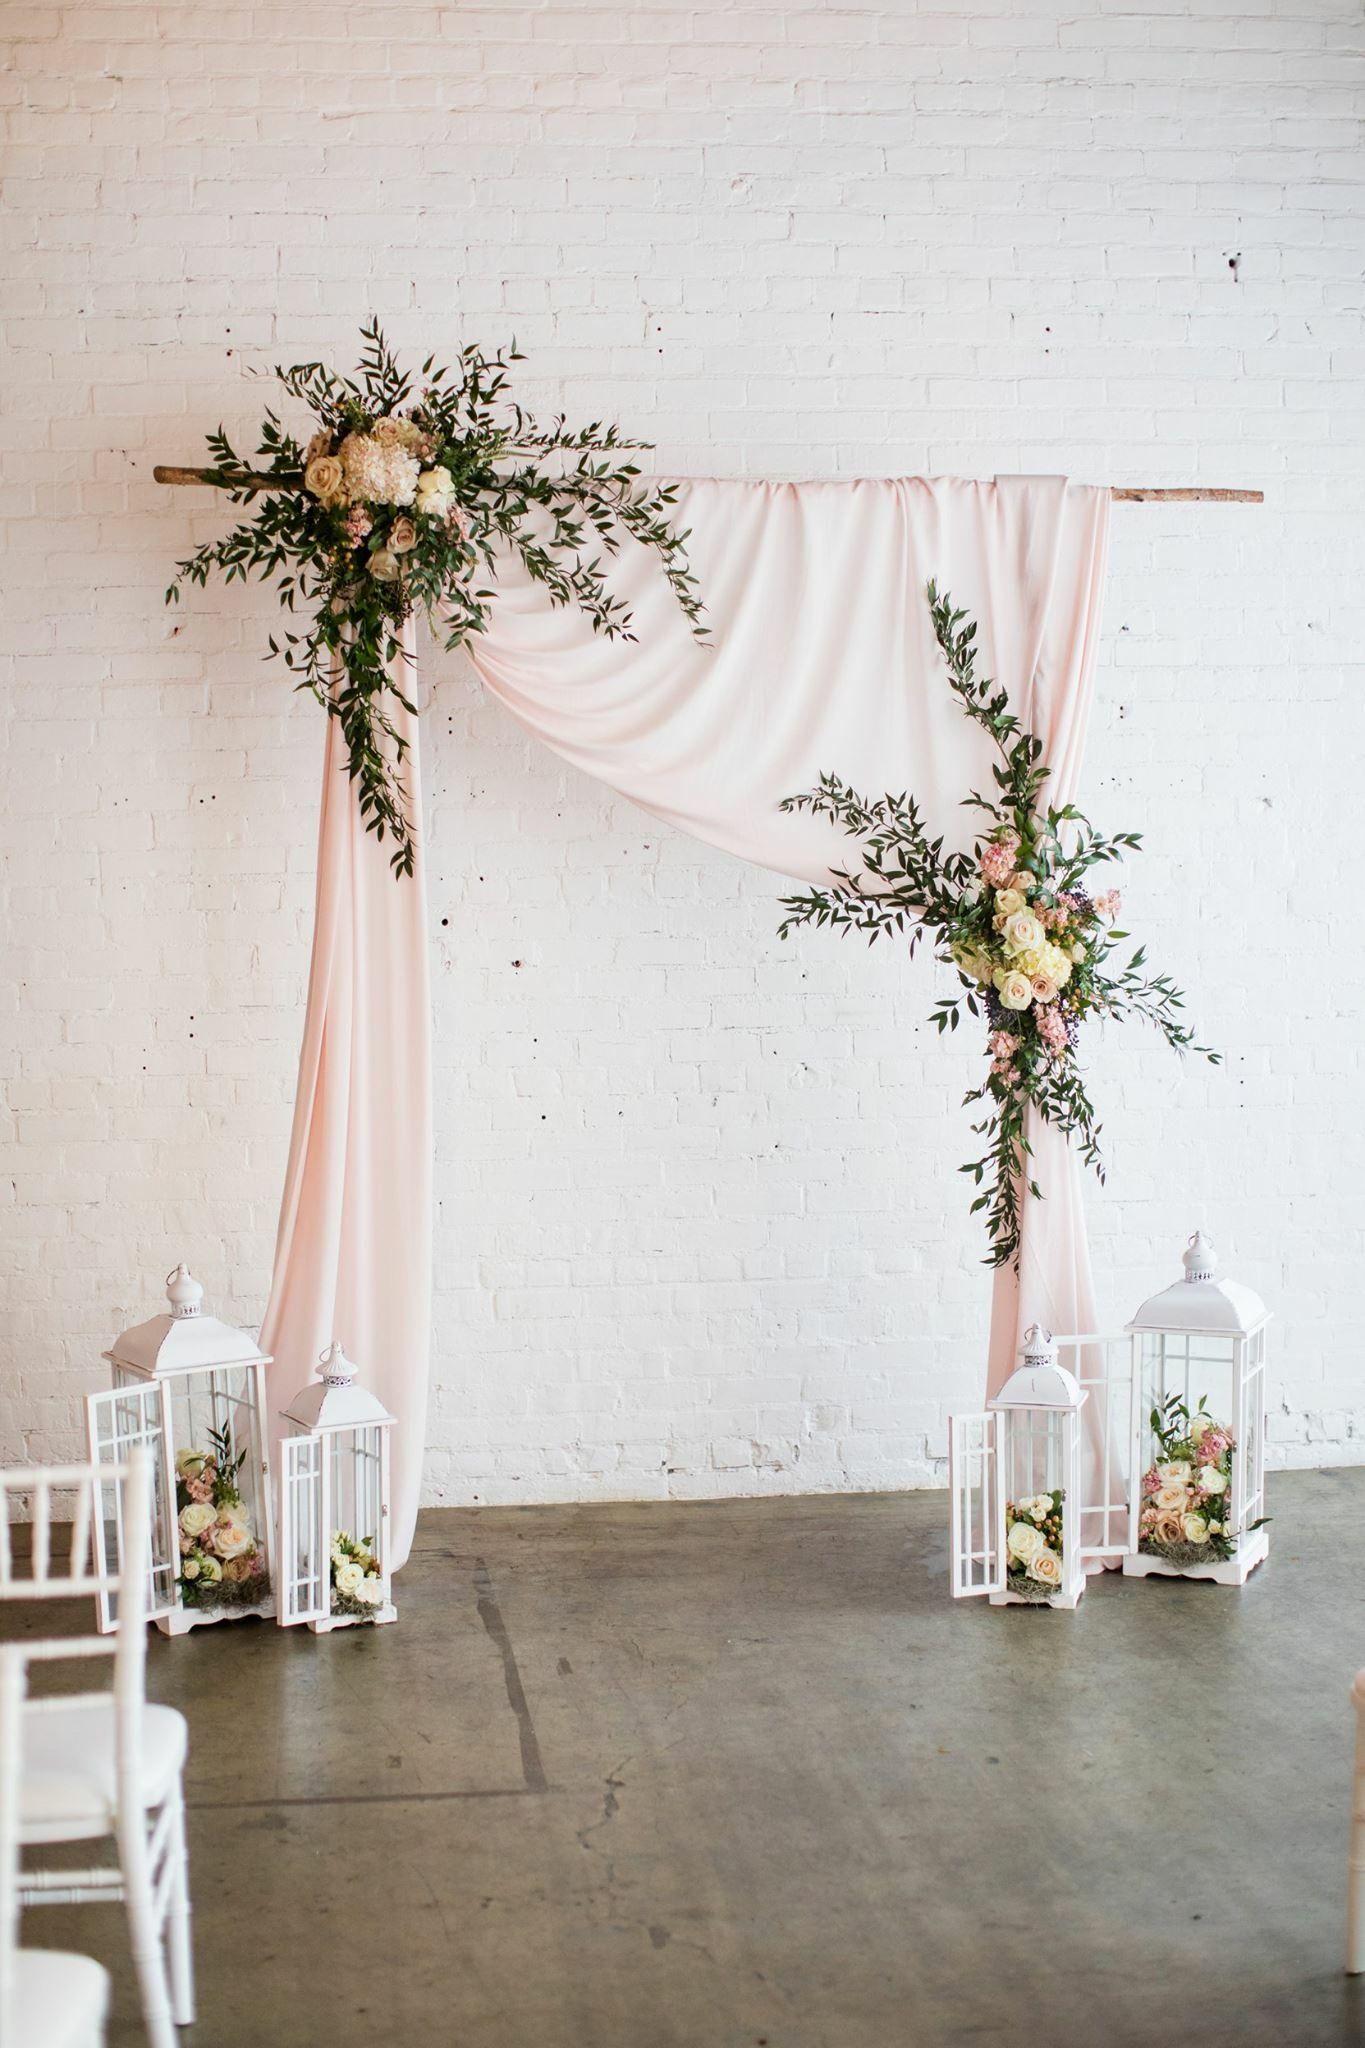 Beautiful Draped Wedding Arch By Blossom Farm Vintage Rentals Wedding Ceremony Backdrop Diy Wedding Arch Wedding Arch